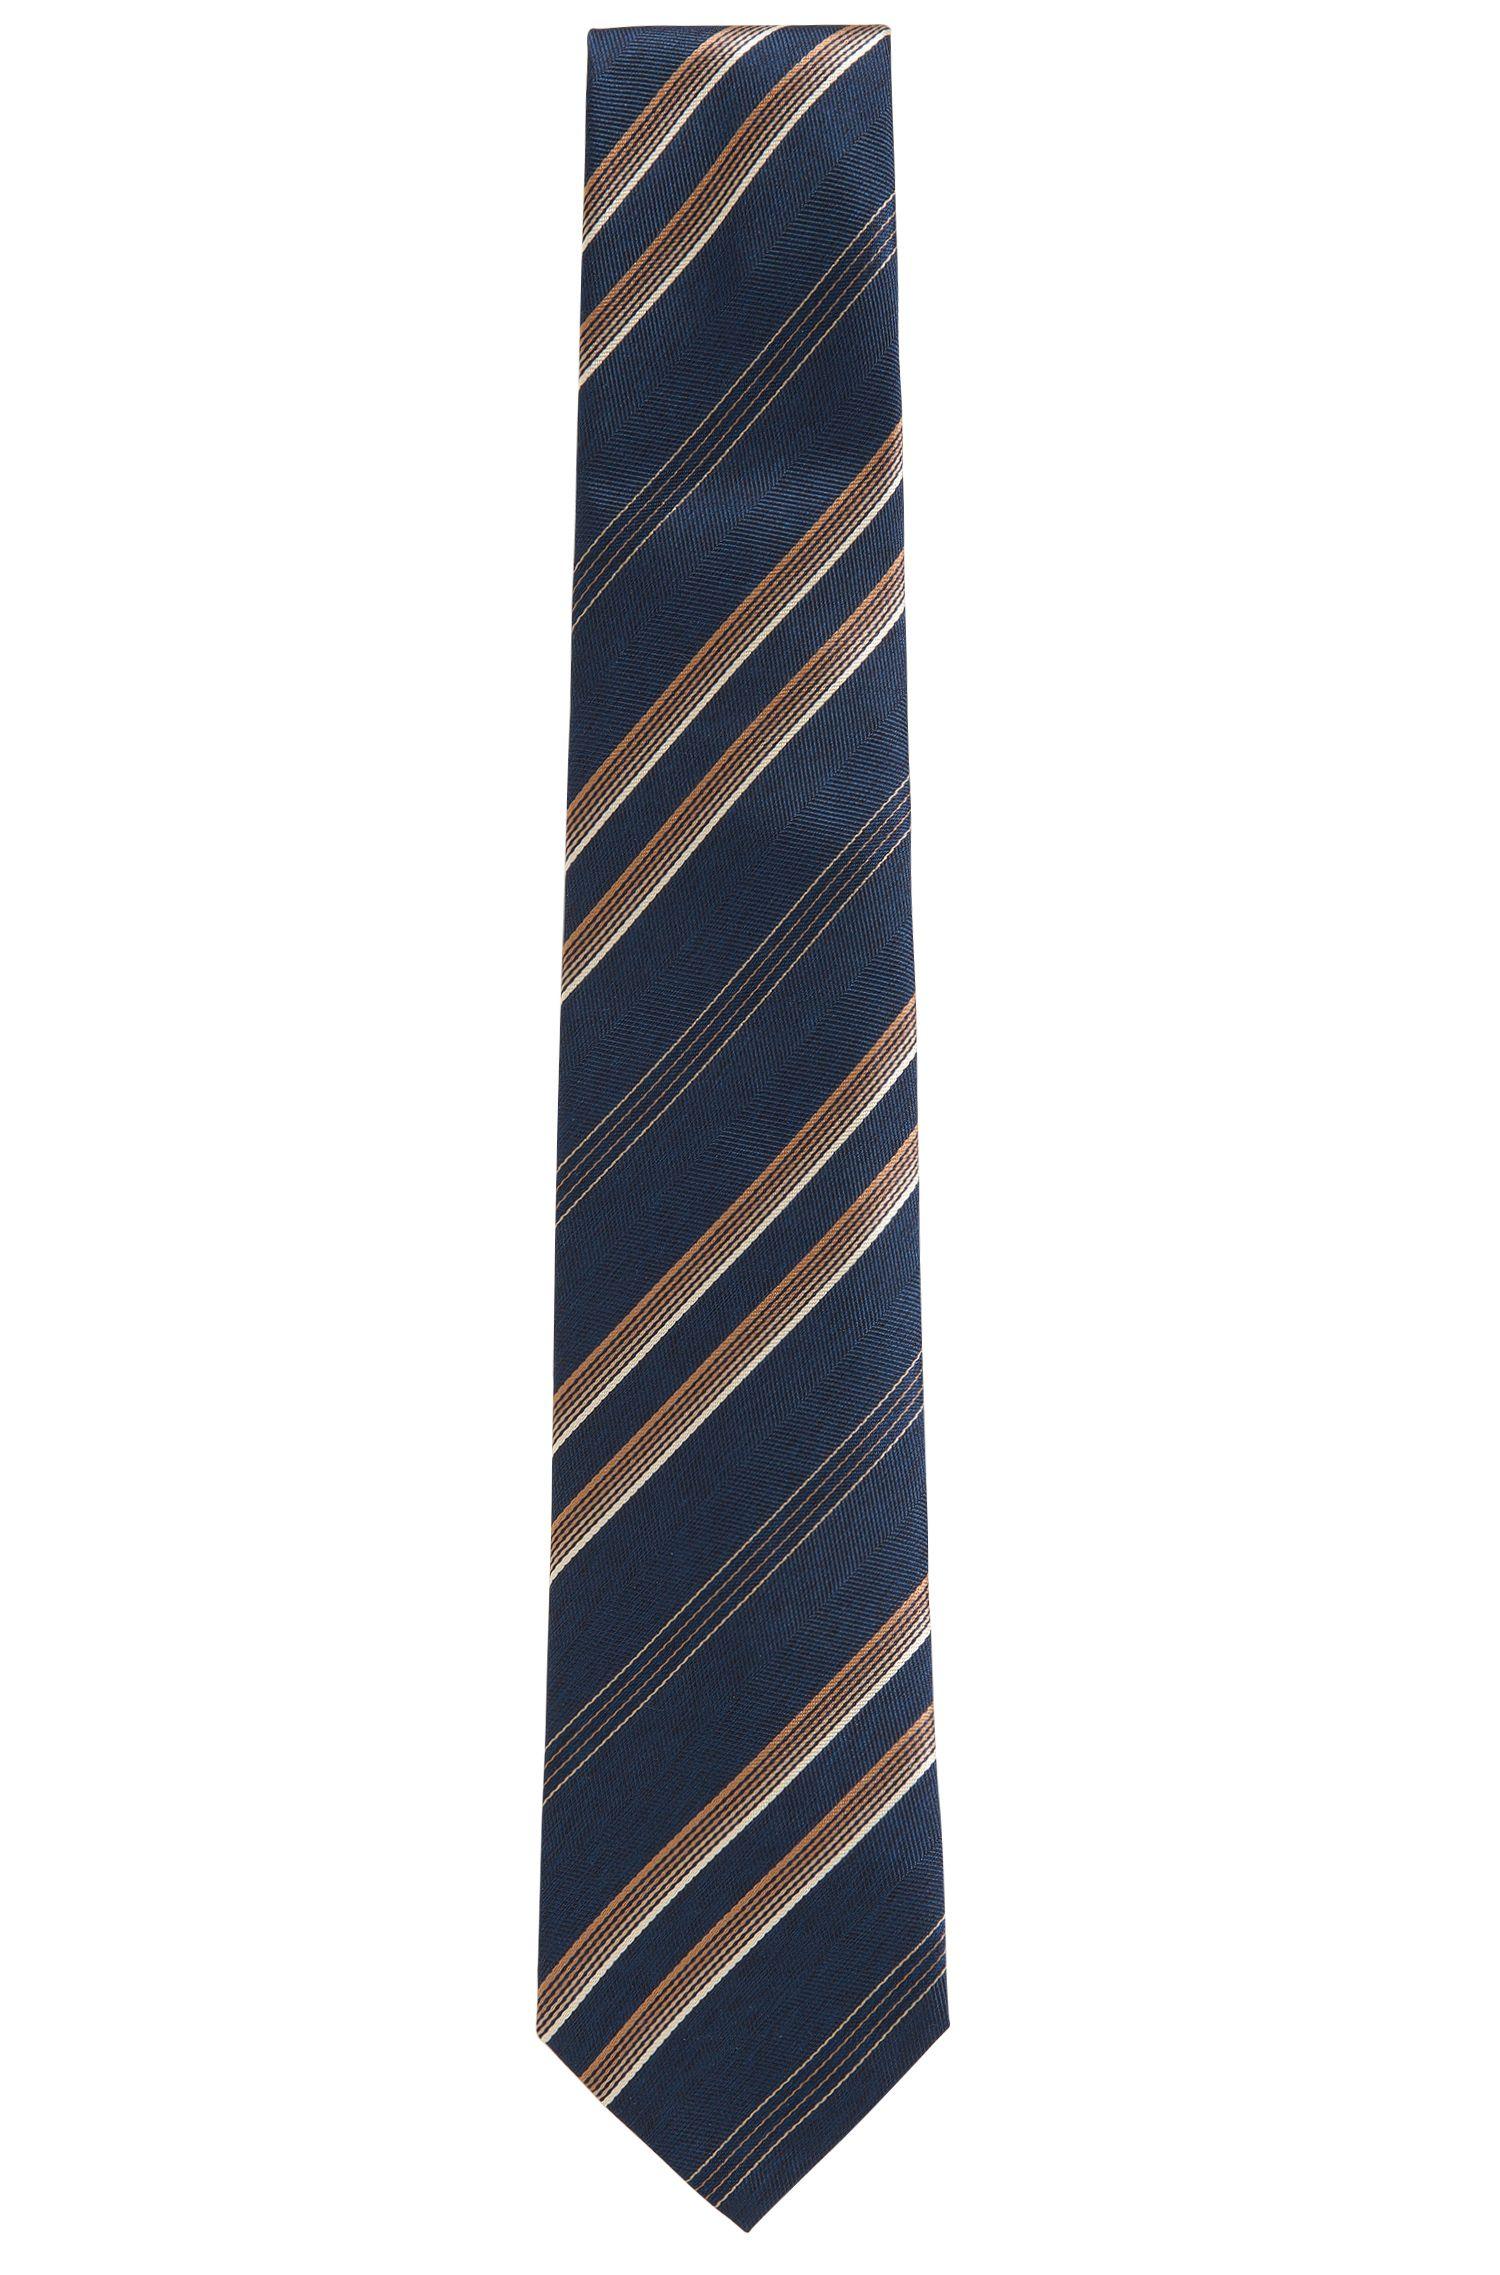 BOSS Tailored Striped Italian Silk Tie